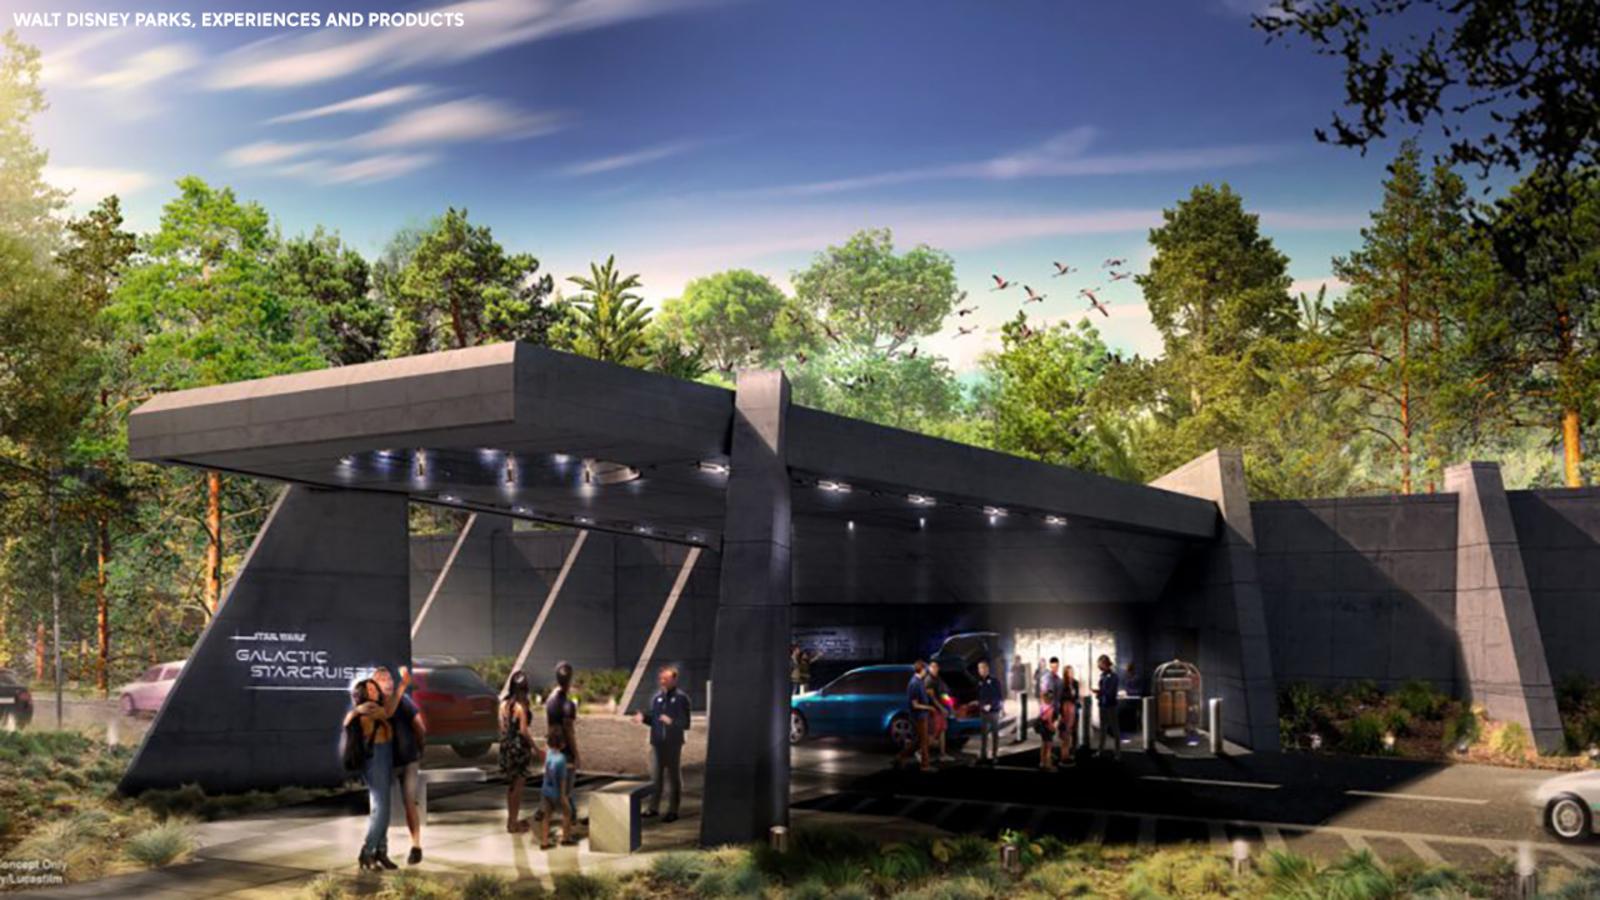 Star Wars immersive hotel to open at Walt Disney World in 2021